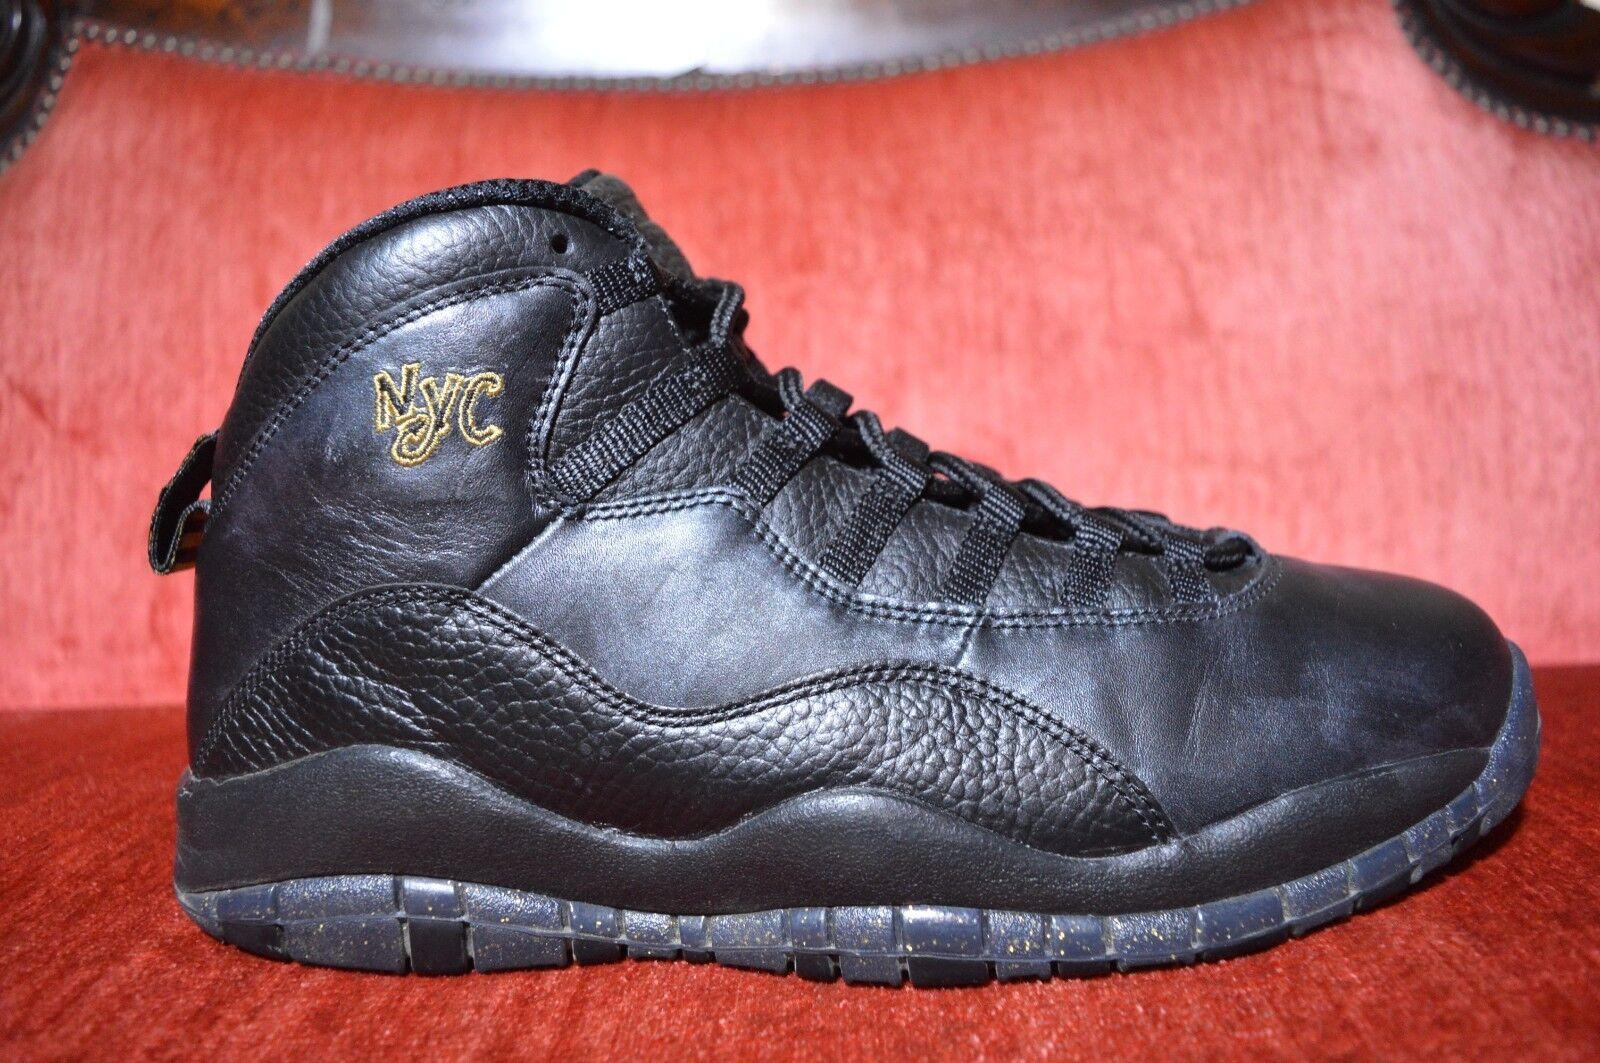 f03f3428cb Nike JORDAN 10 RETRO X Size 11 BLACK CITY PACK NEW YORK NYC City gold AIR  nnslzn4137-new shoes